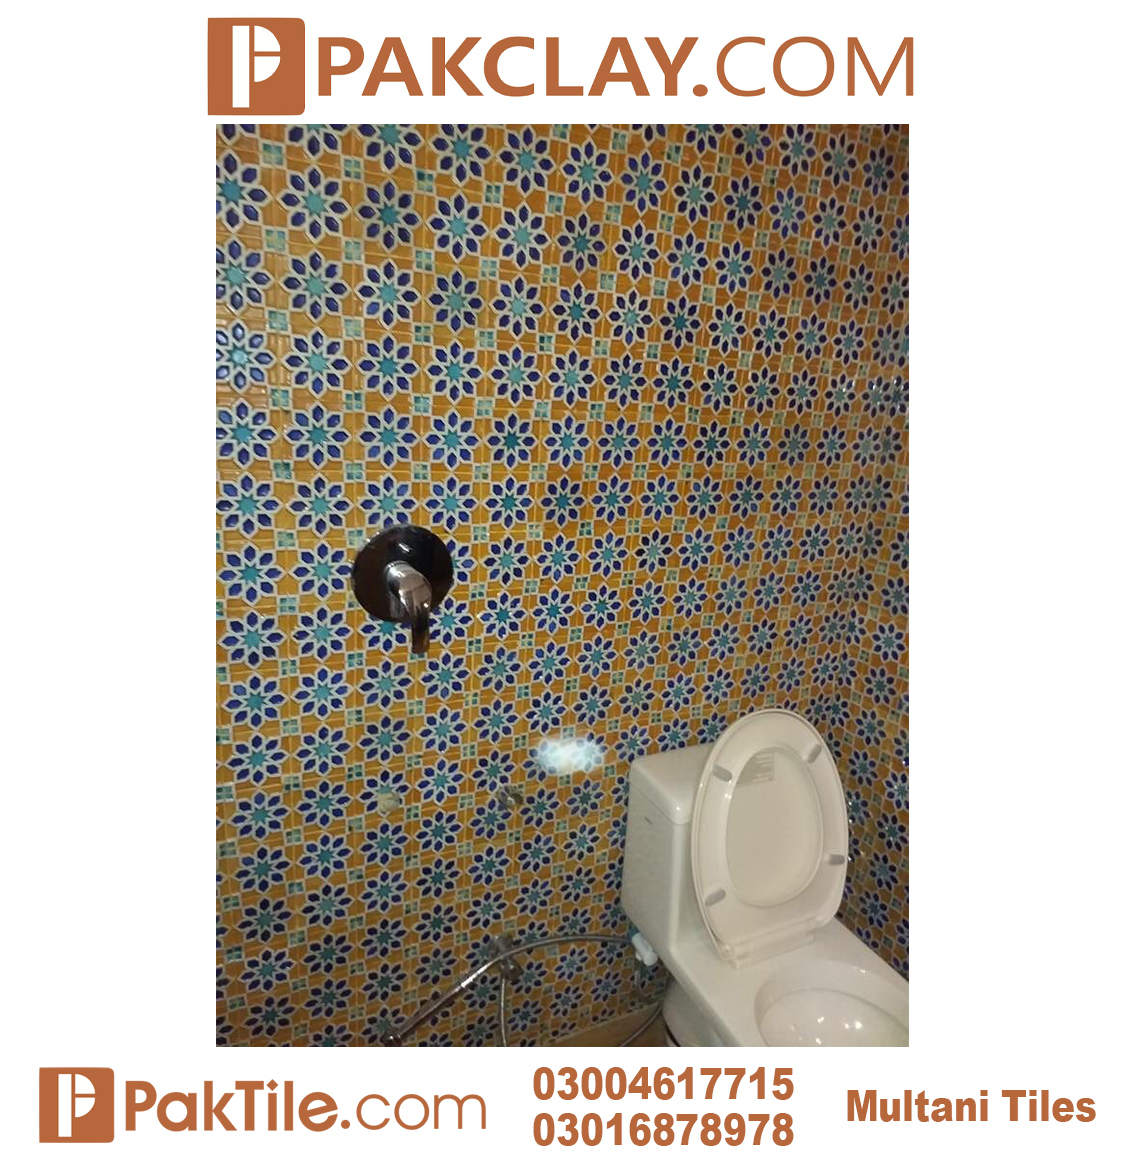 Pak Clay Multani Tiles in Lahore Bathroom Wall Tiles Design